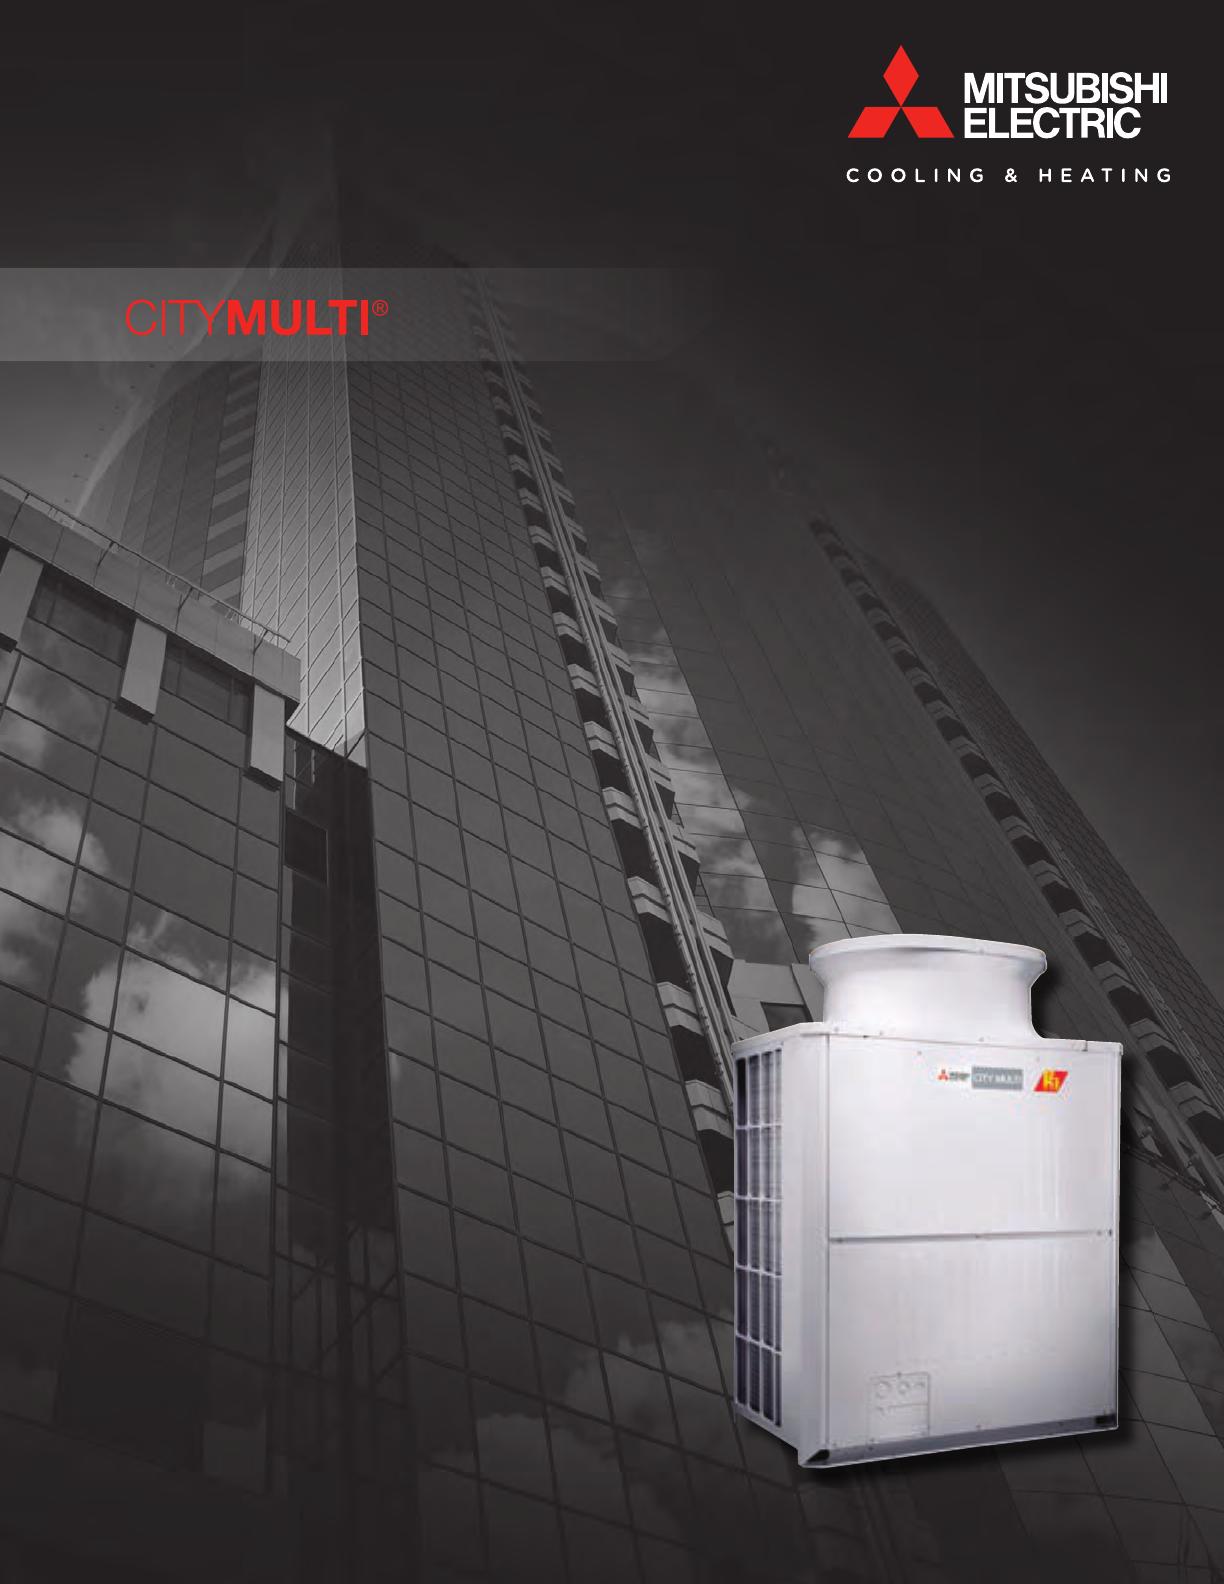 MITSUBISHI ELECTRIC Cooling & Heating / CITY MULTI / FC1 V